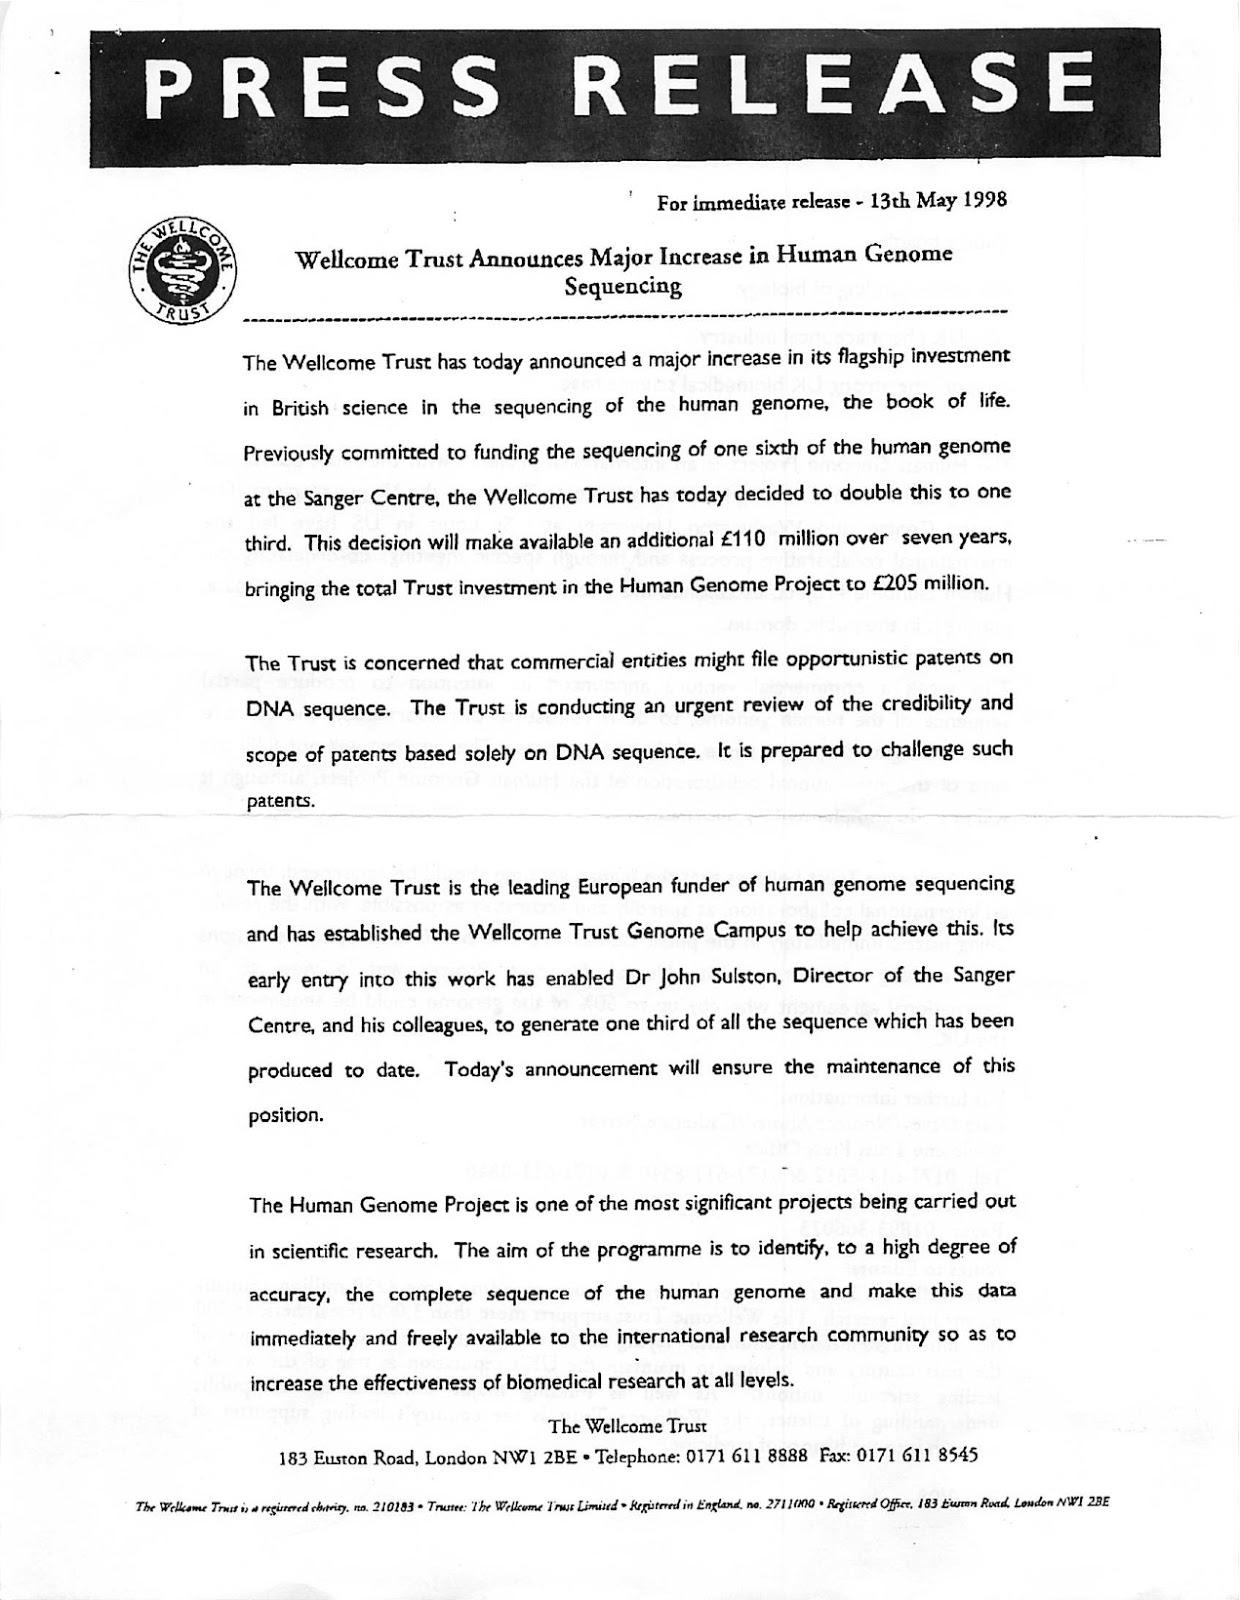 embargoed press release sample